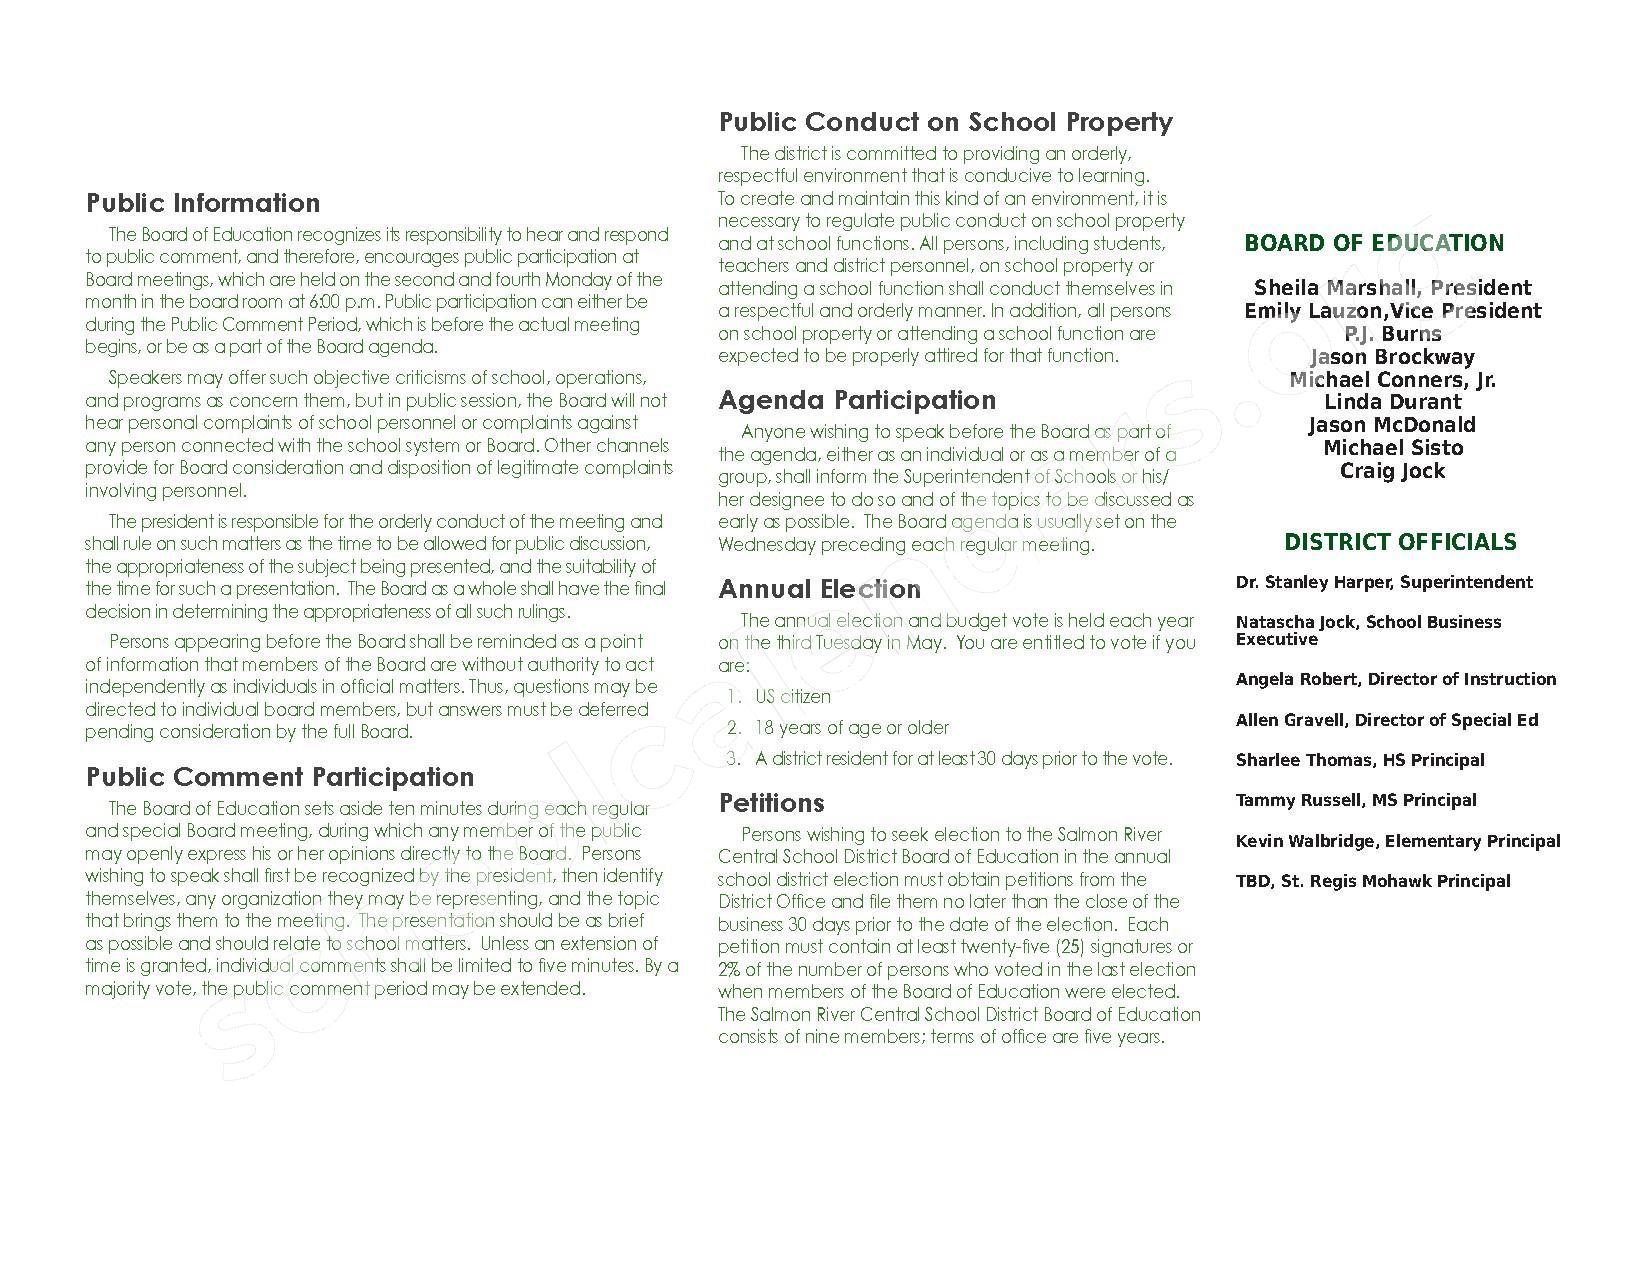 2016 - 2017 School Calendar – Salmon River Central School District – page 26